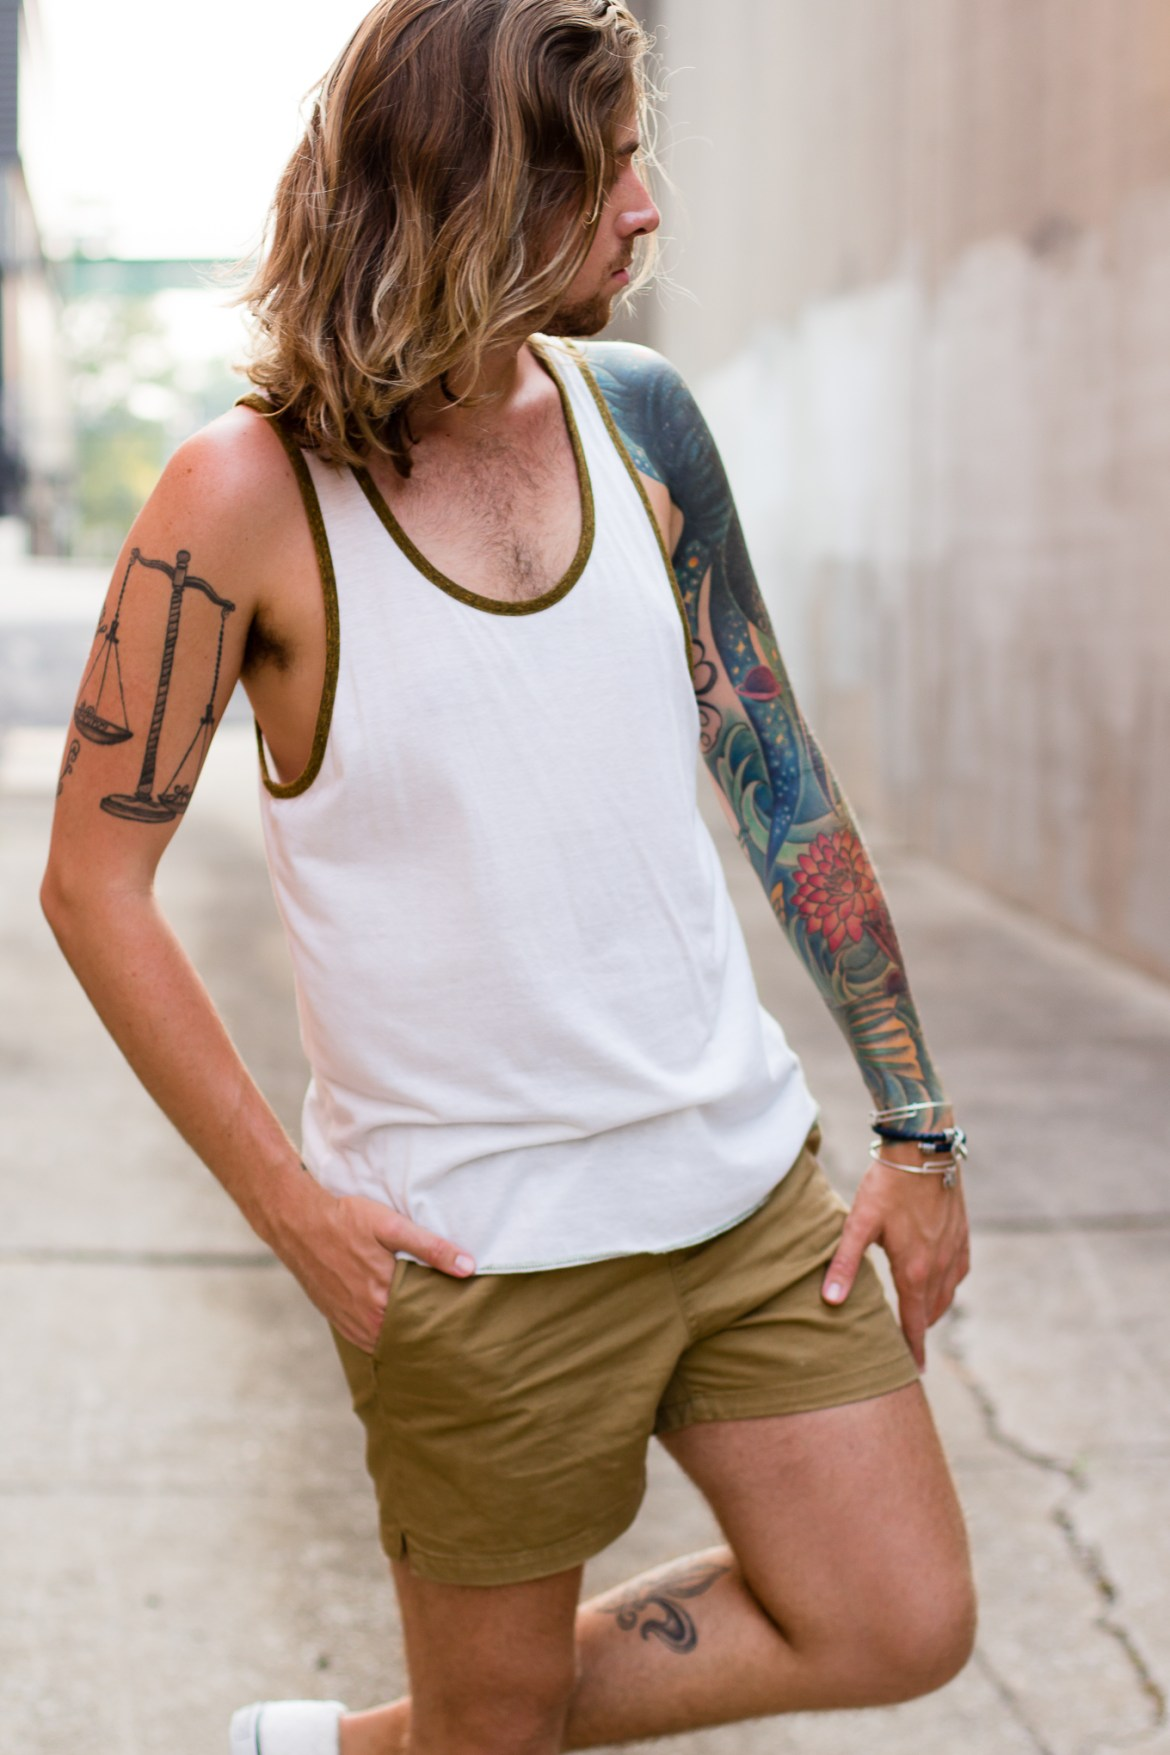 hm, bloglovin, breakthrough blogger of the year, sperry, mens fashion blog